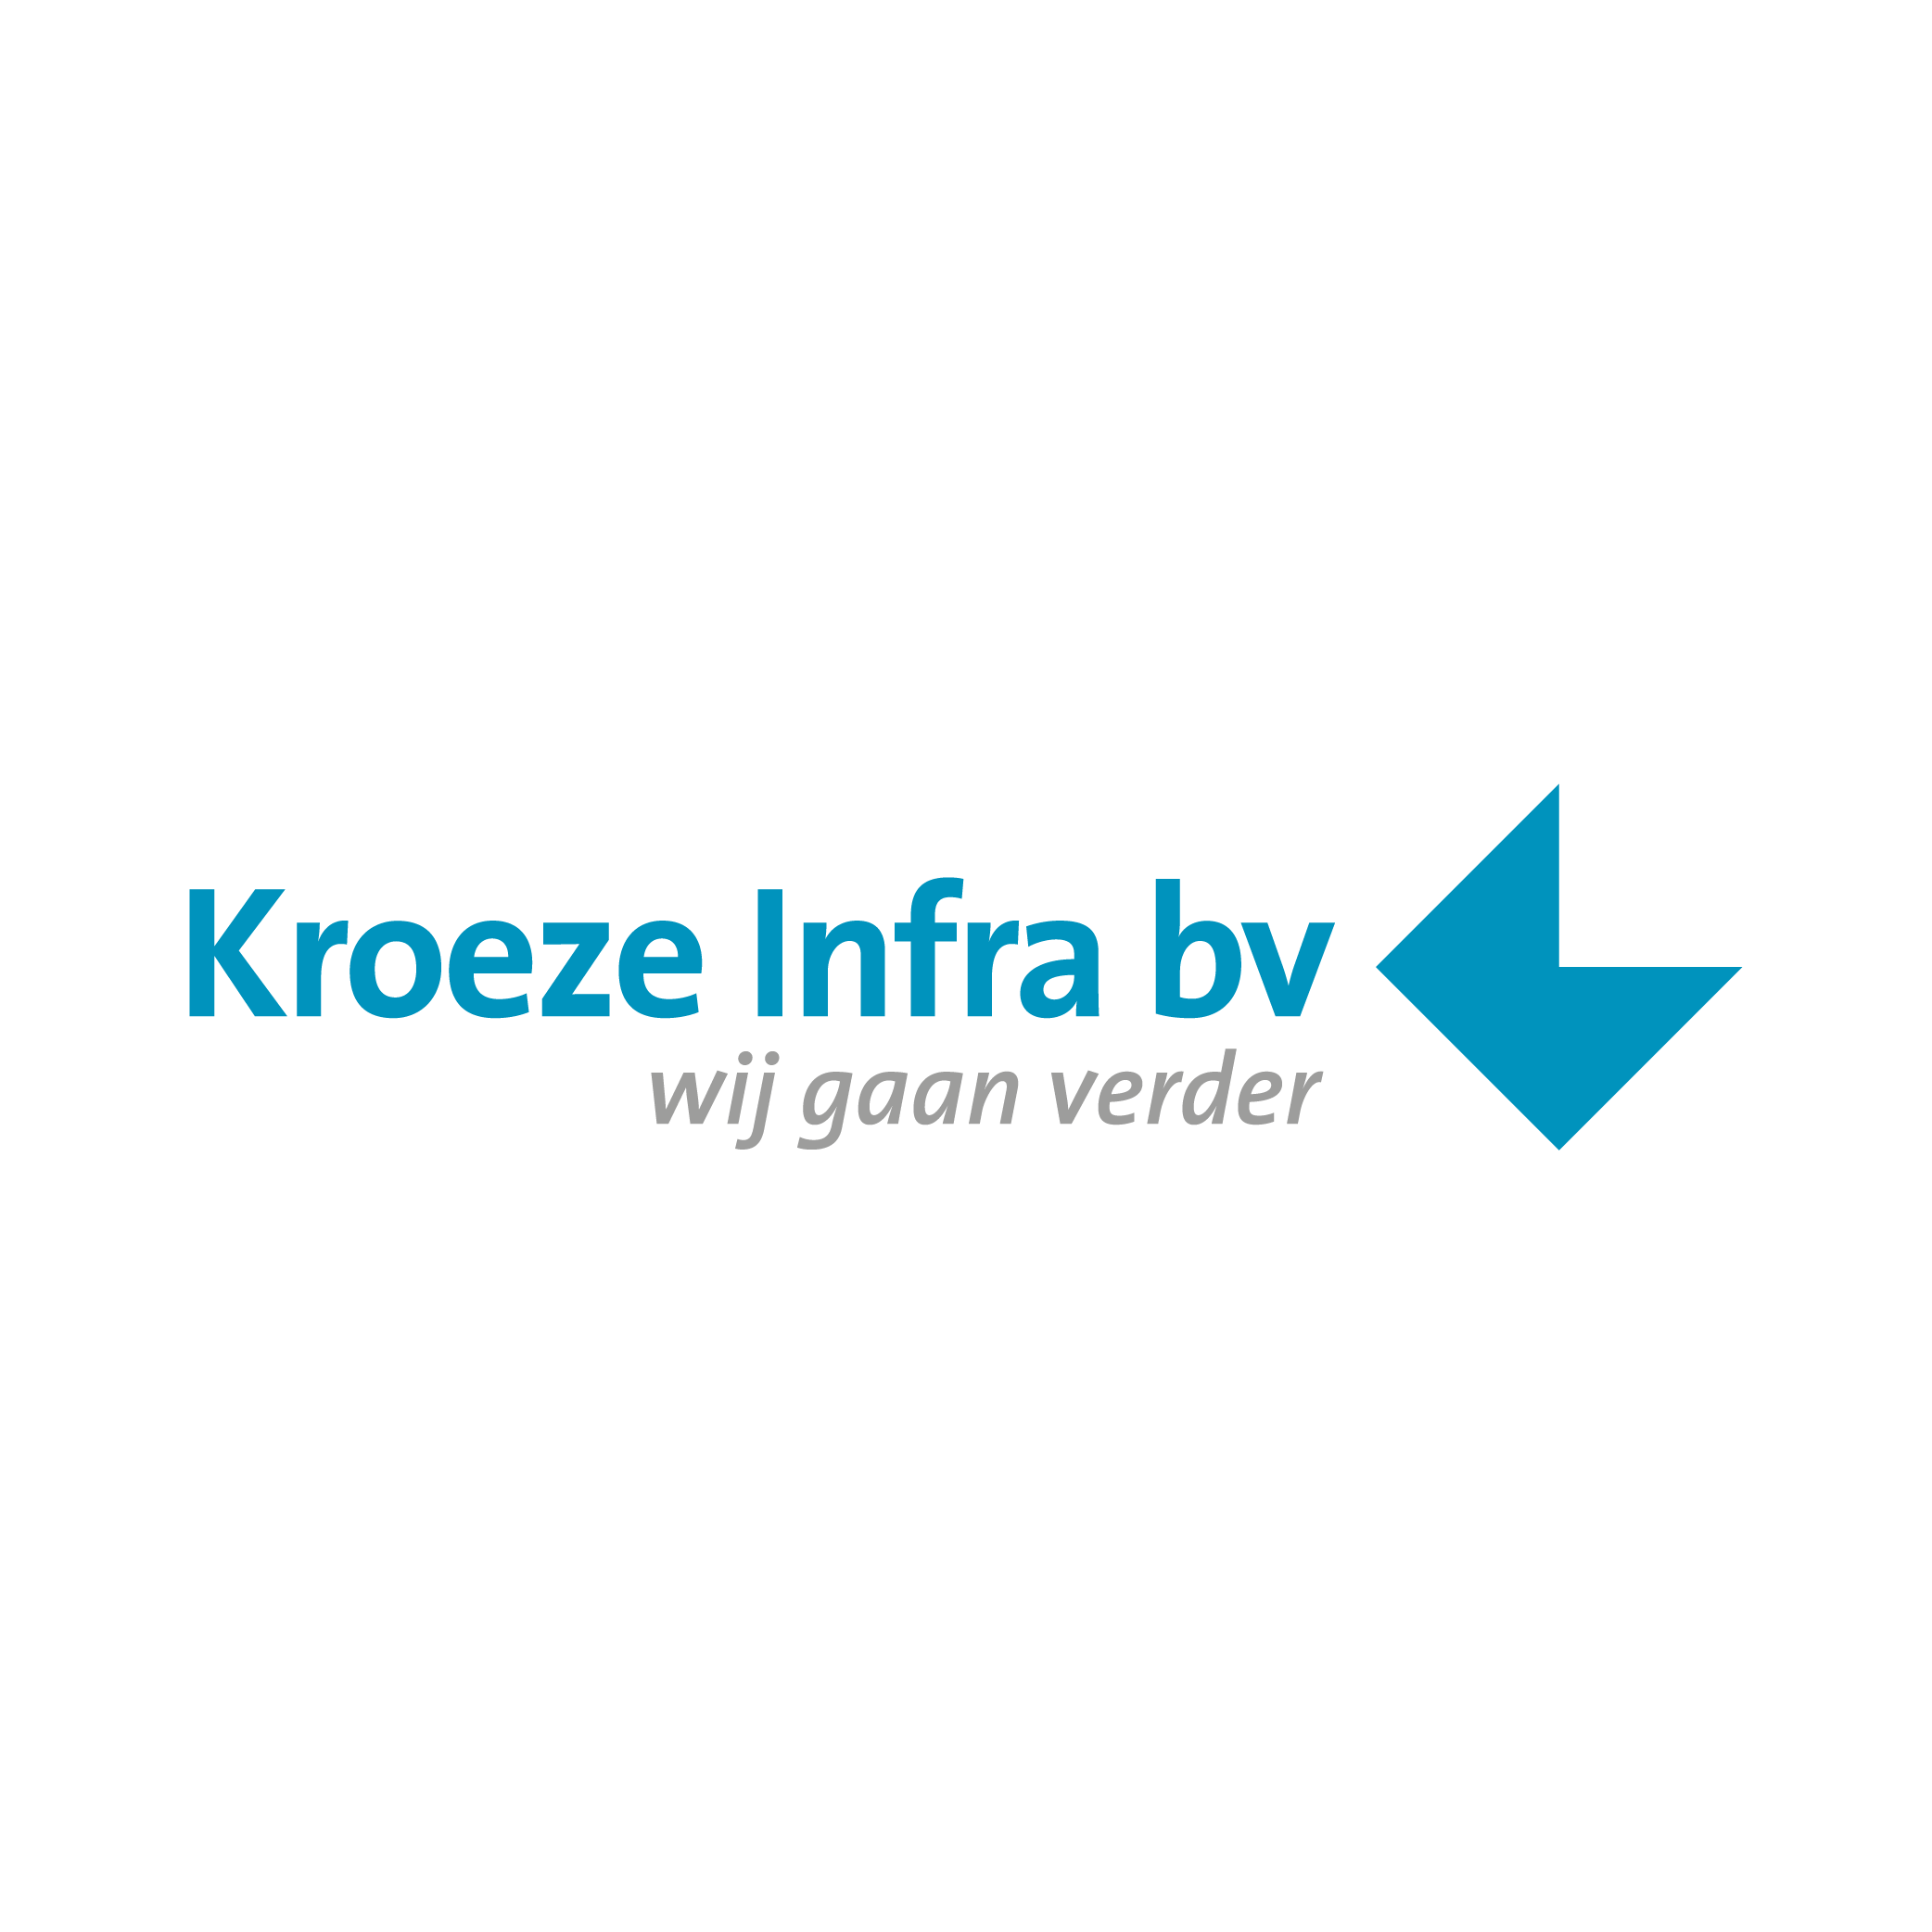 Kroeze Infra